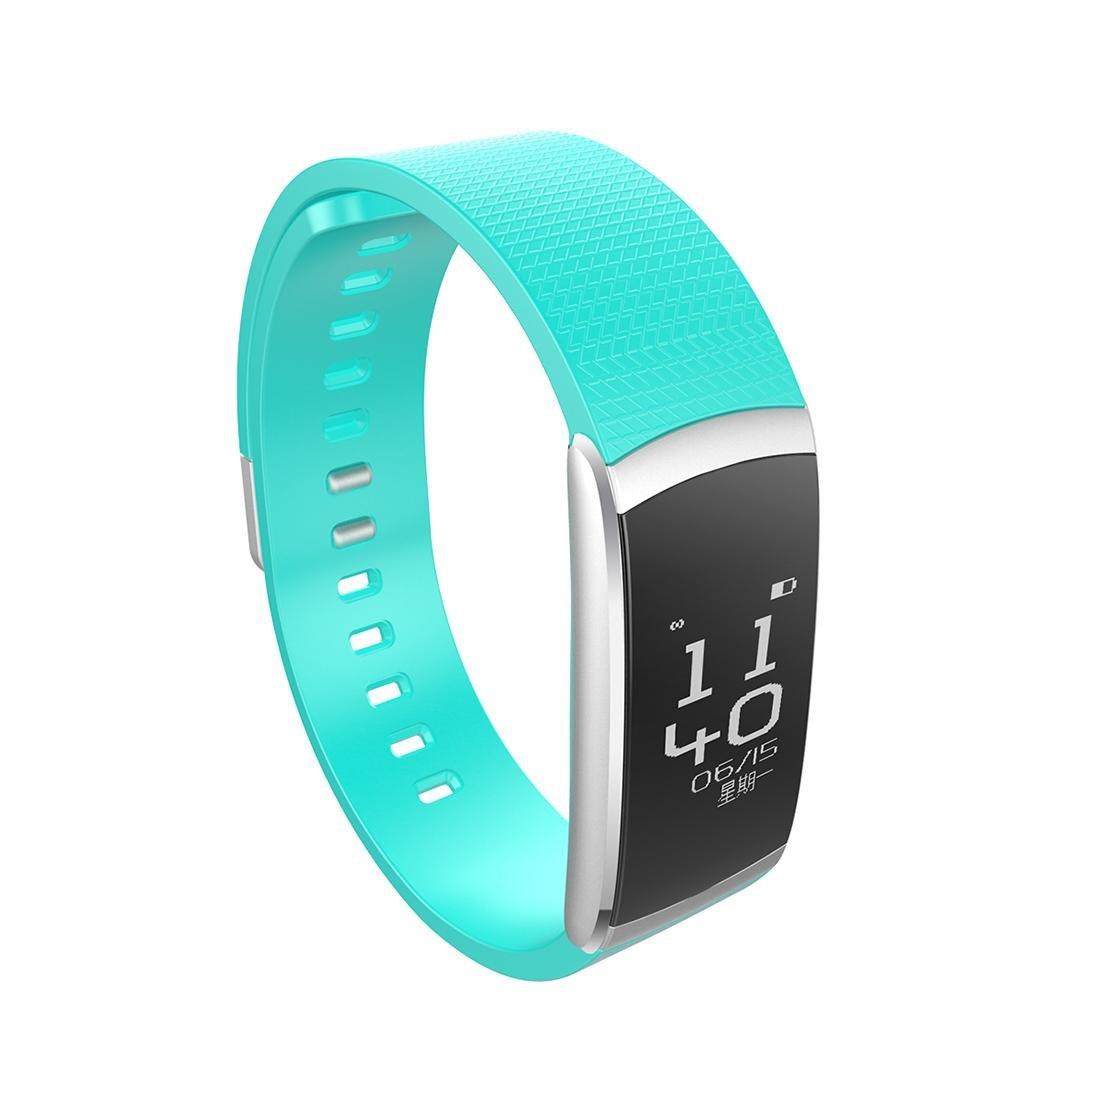 LDD SPORTS i6pro pantalla grande anillo de mano inteligente ritmo cardíaco mensaje de control de empuje deportes podómetro , black